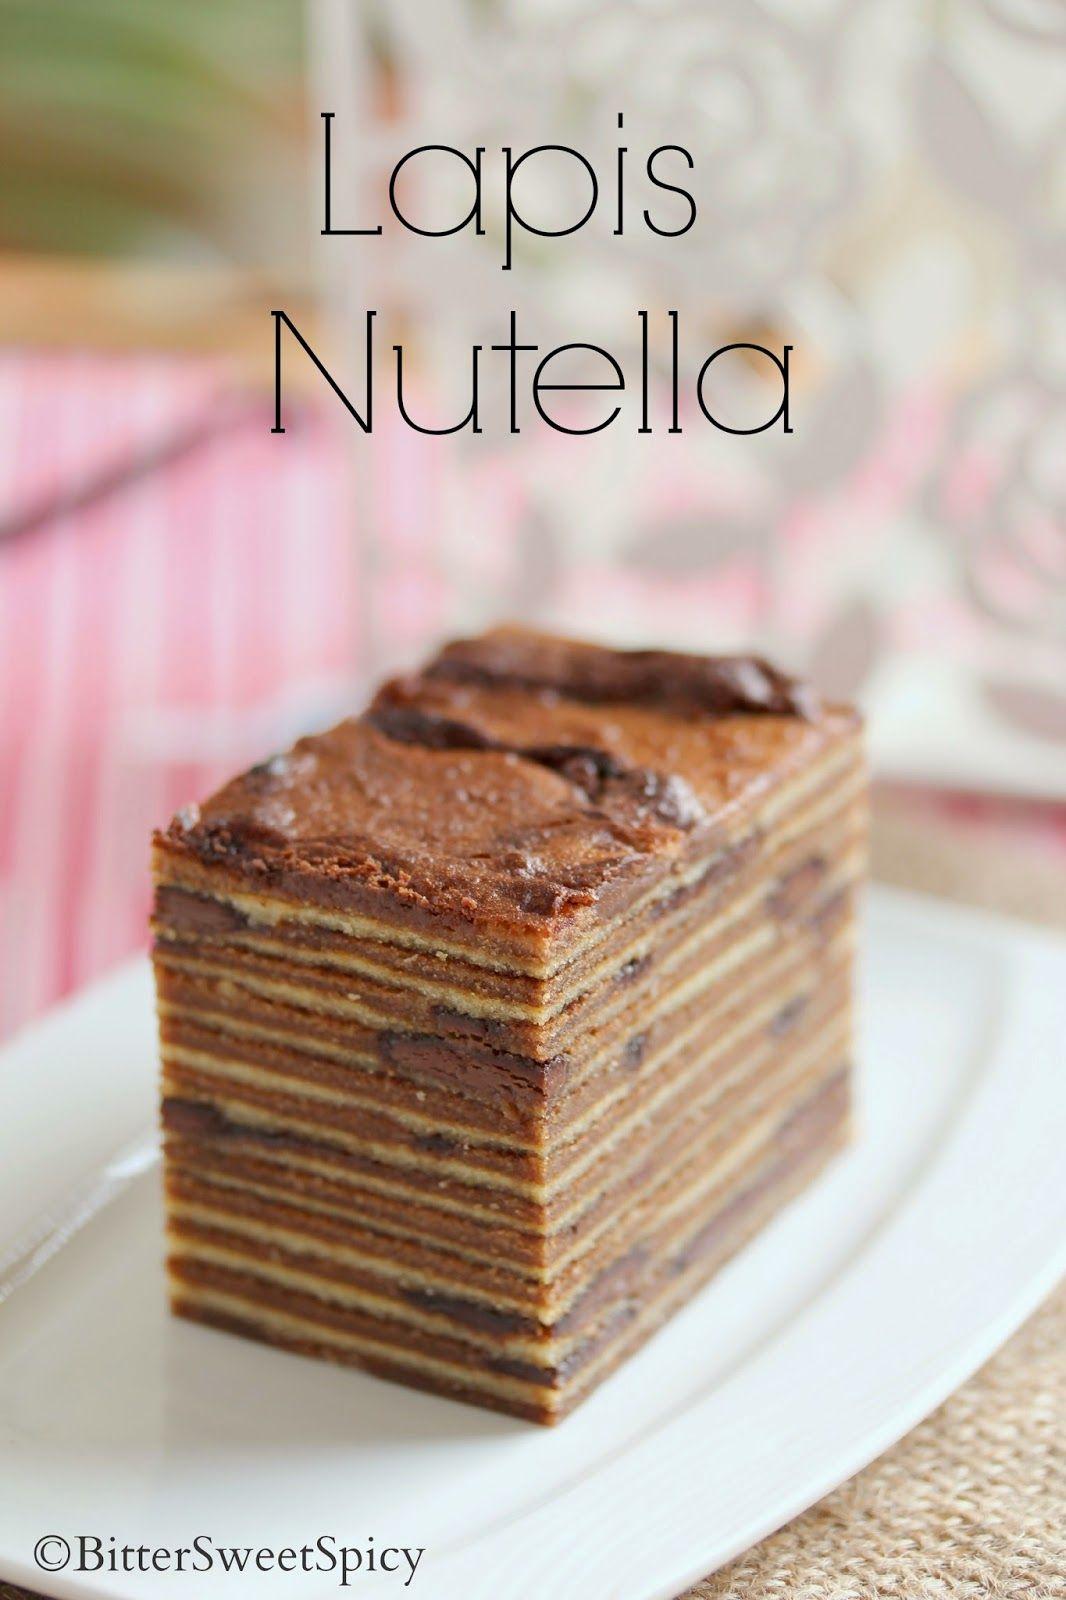 Lapis Nutella Cake Resep Nutella Kue Nutella Makanan